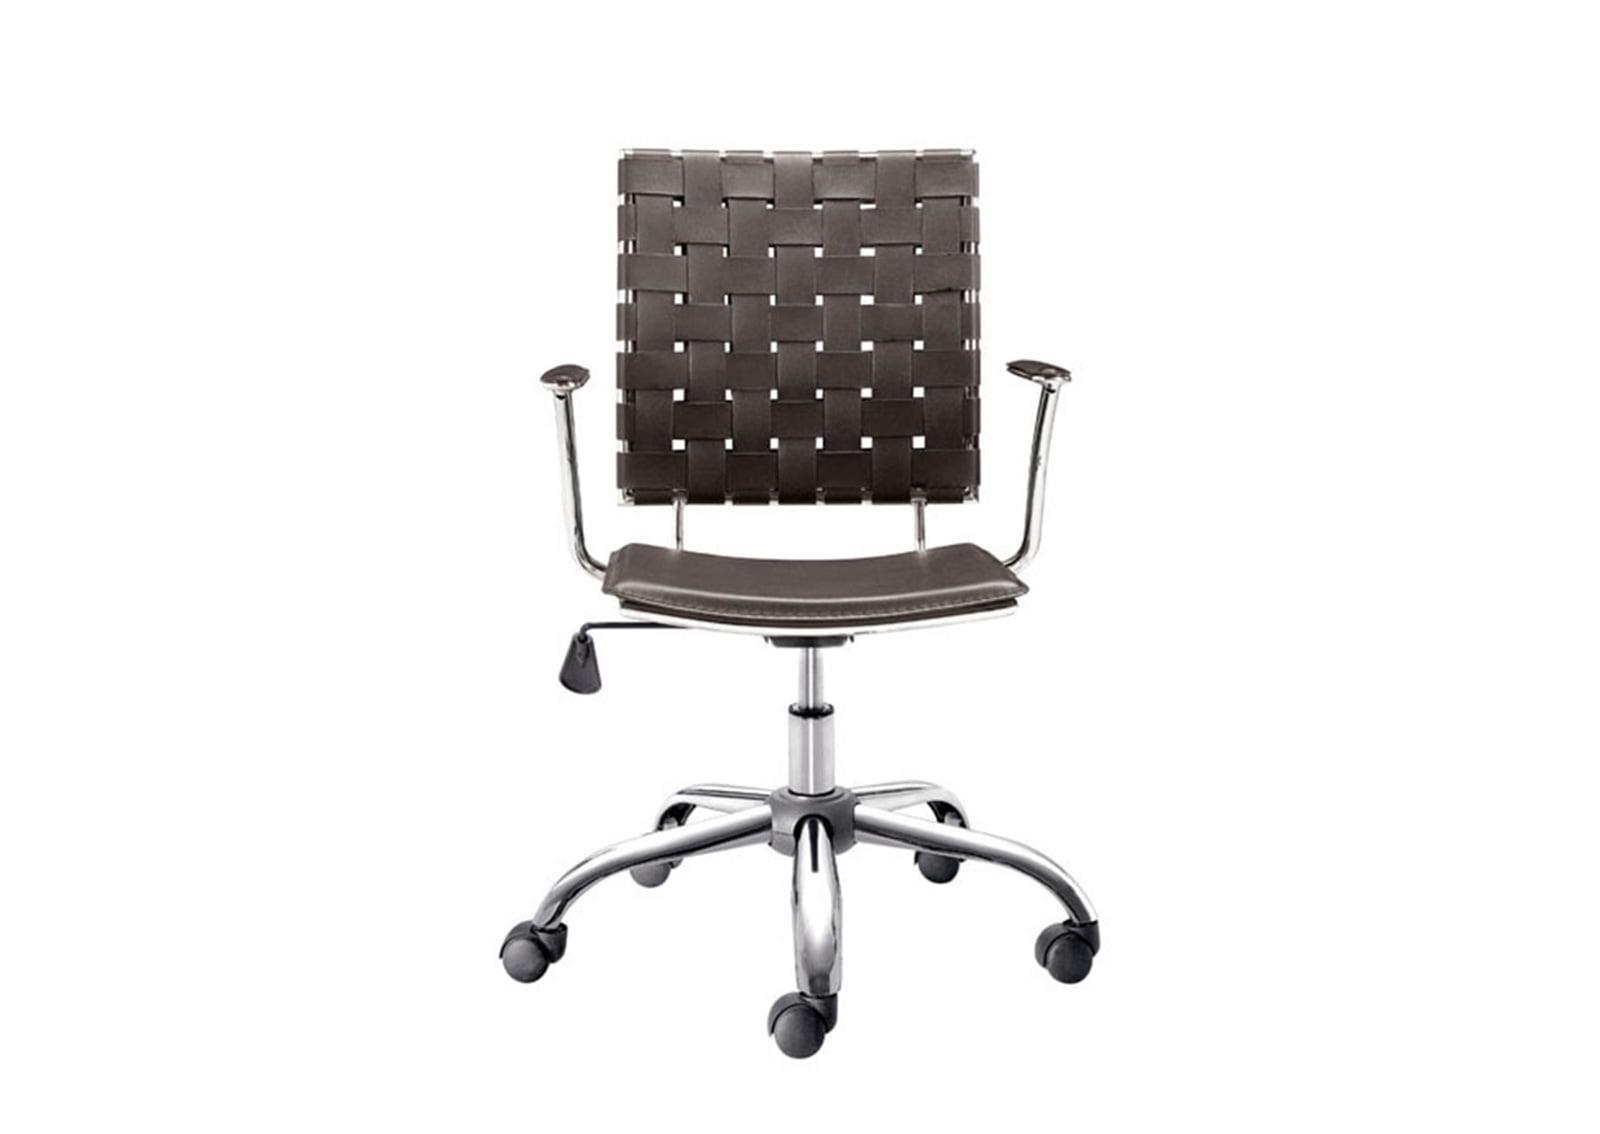 Criss Cross Office Chair Espresso Furnishplus